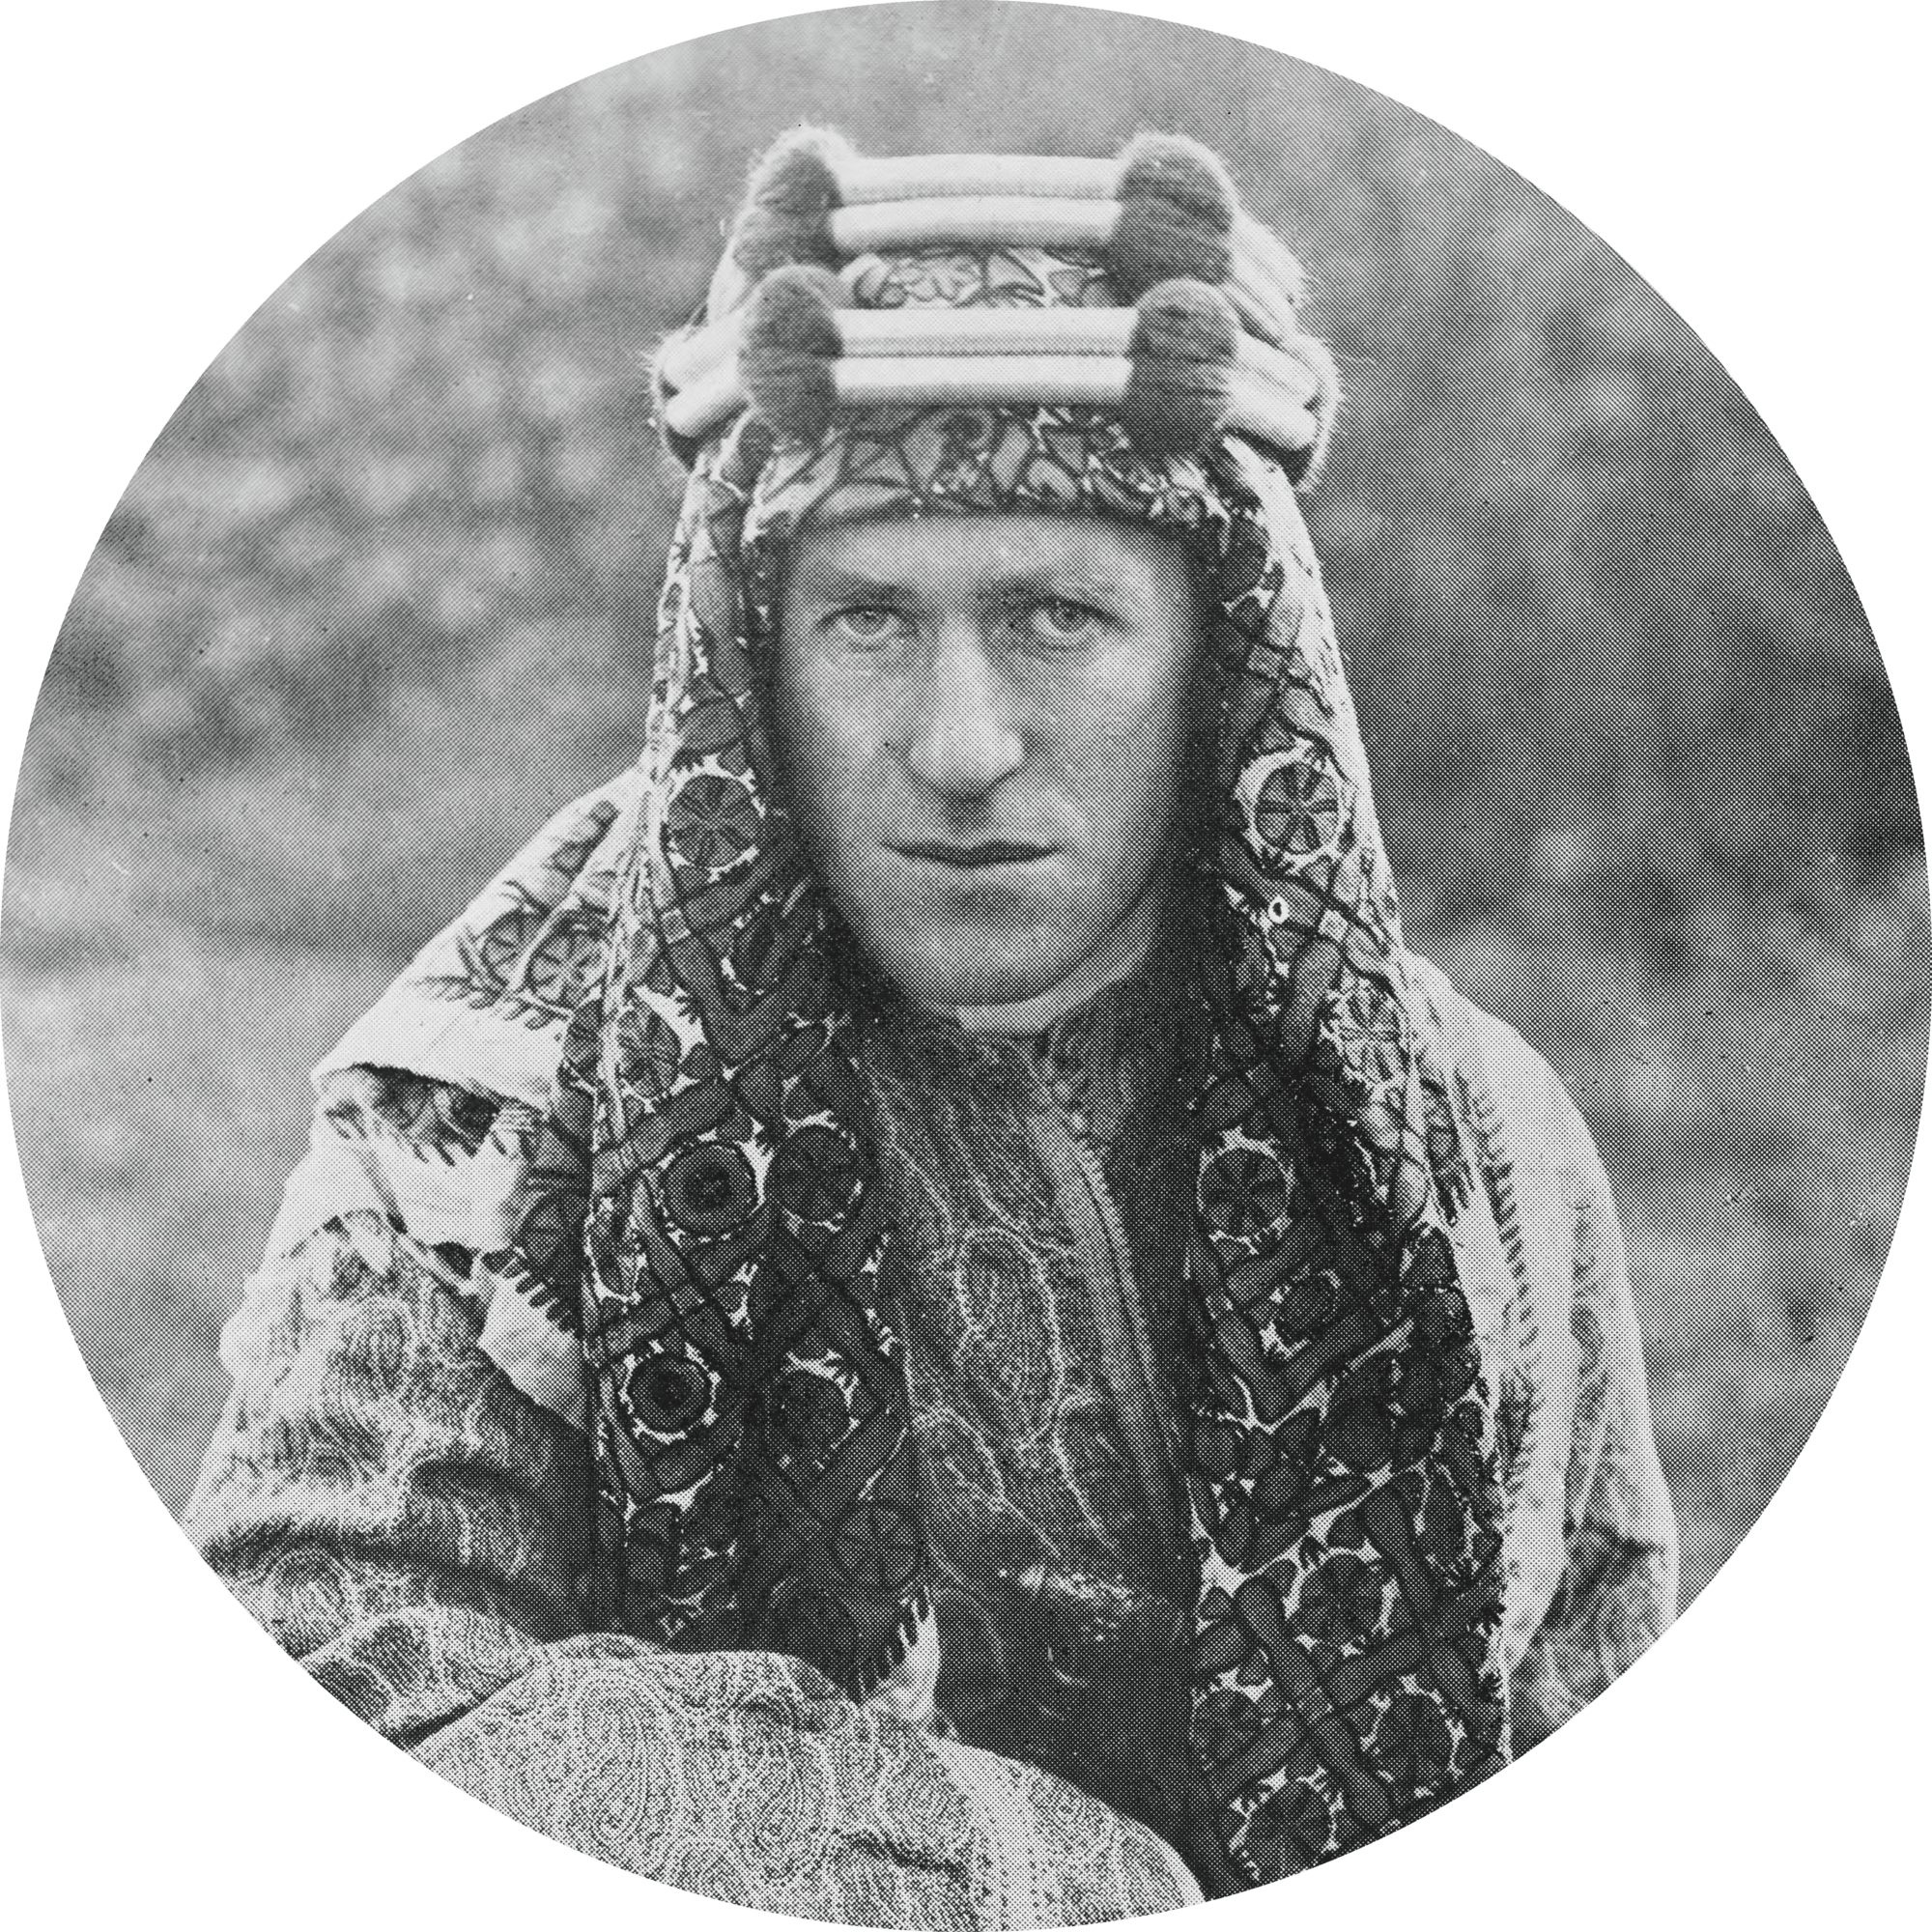 T.E. Lawrence dit Lawrence d'Arabie